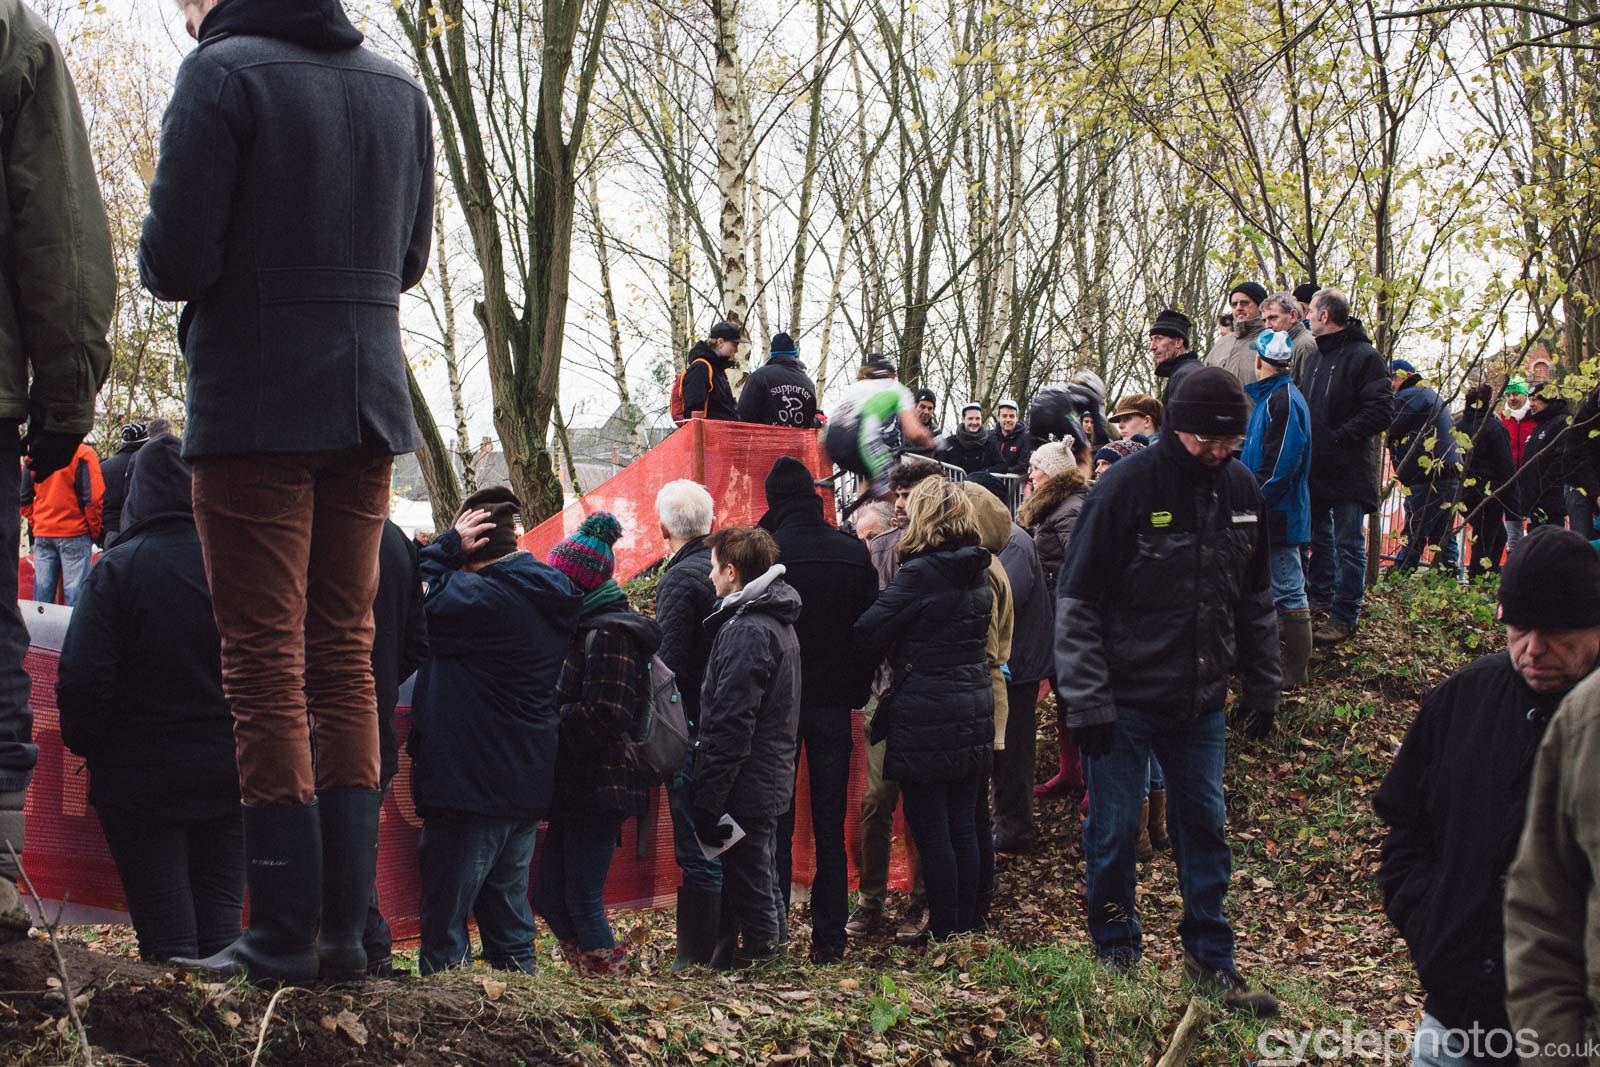 2015-cyclephotos-cyclocross-essen-141619-crowd